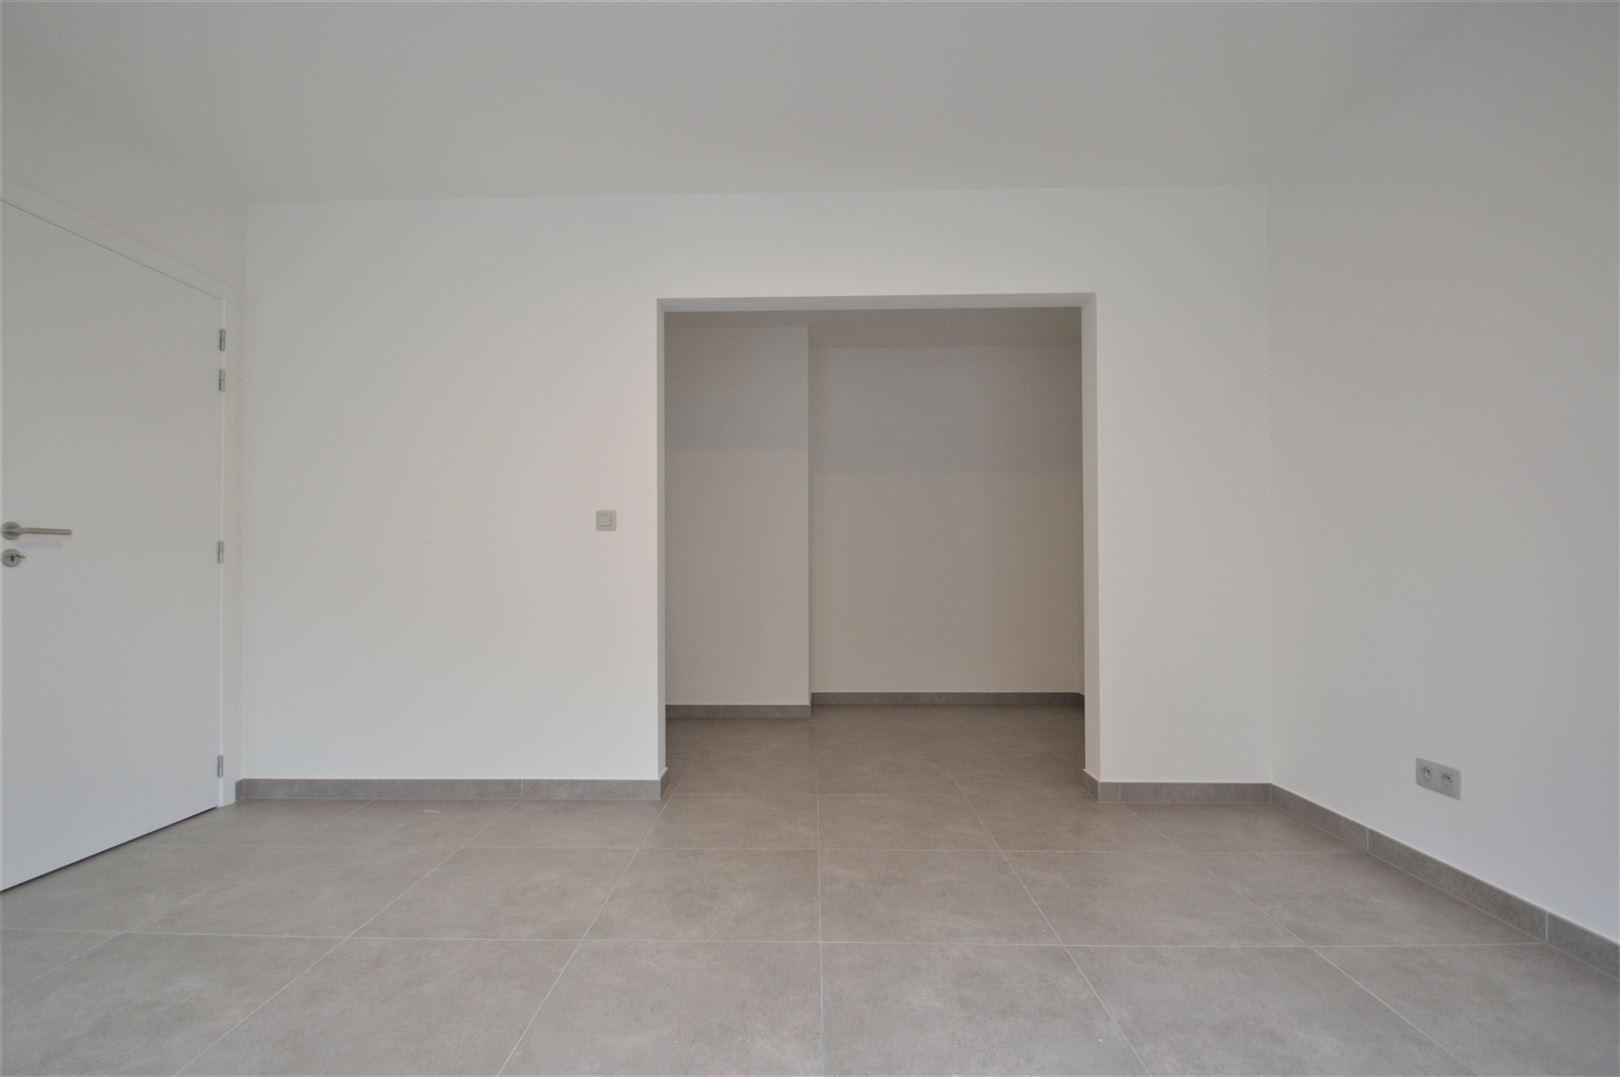 Foto 5 : Huis te 9200 APPELS (België) - Prijs € 950